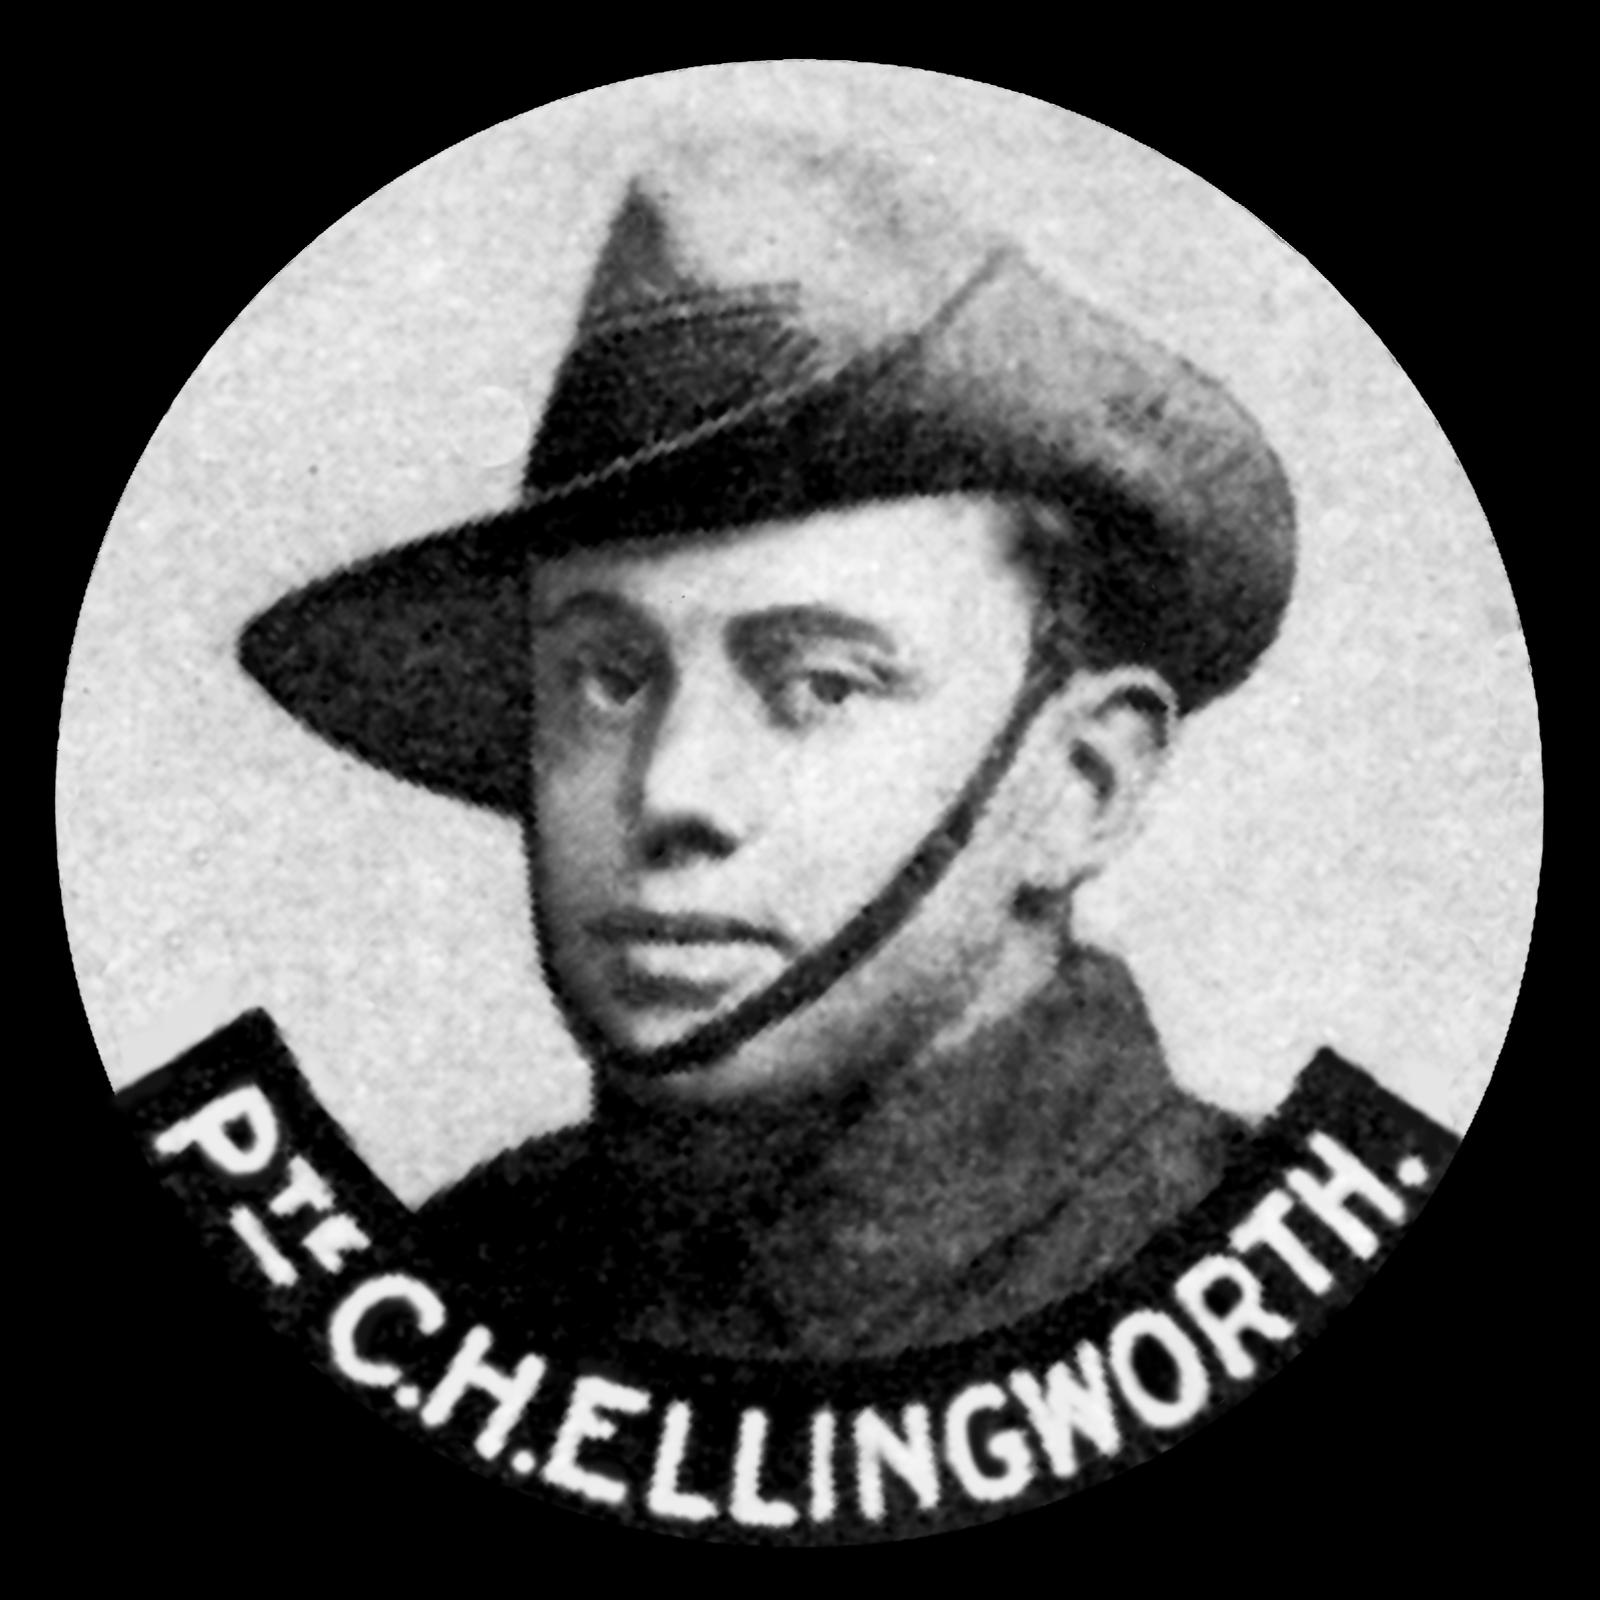 ELLINGWORTH Charles Henry